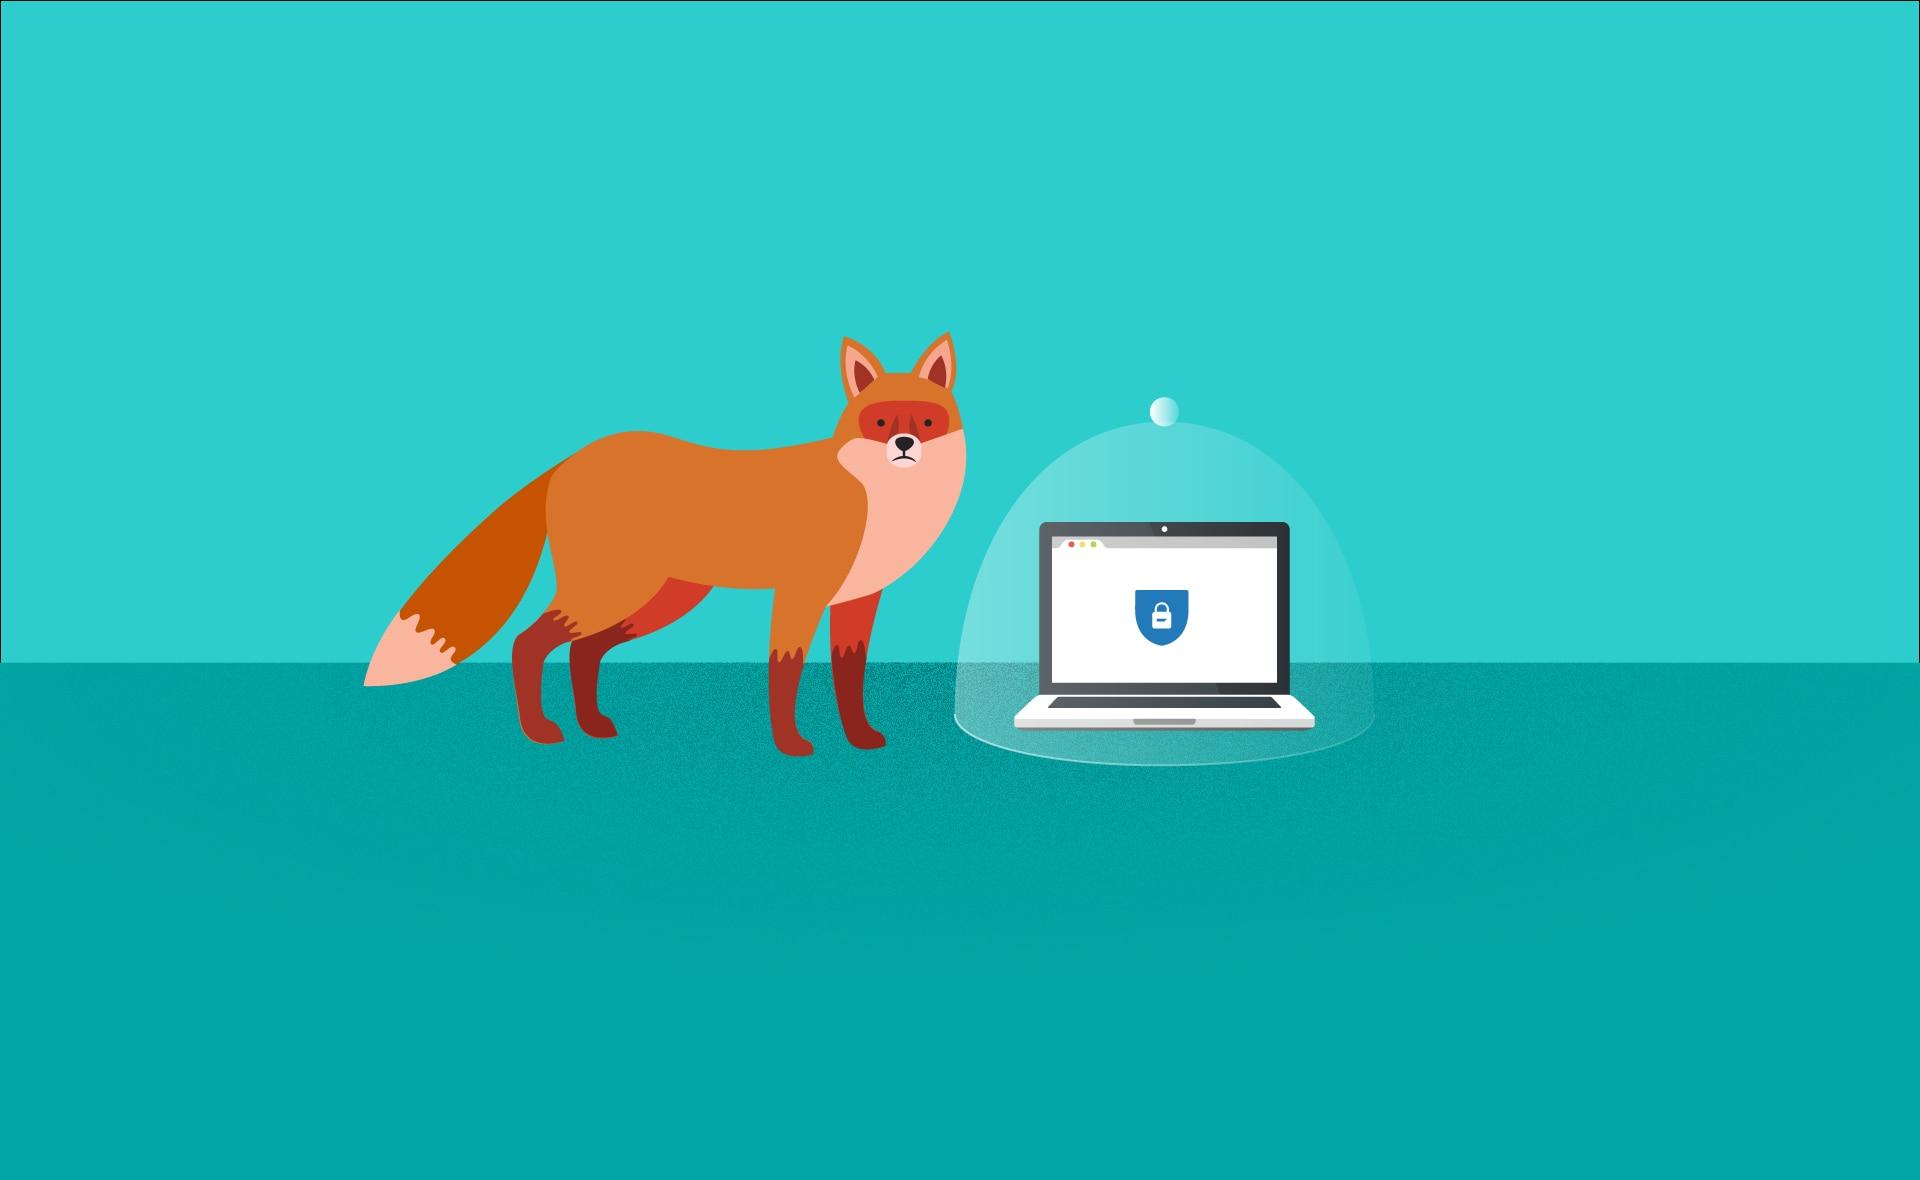 BBVA-Guia-antivirus-consejos-ciberseguridad-ataques